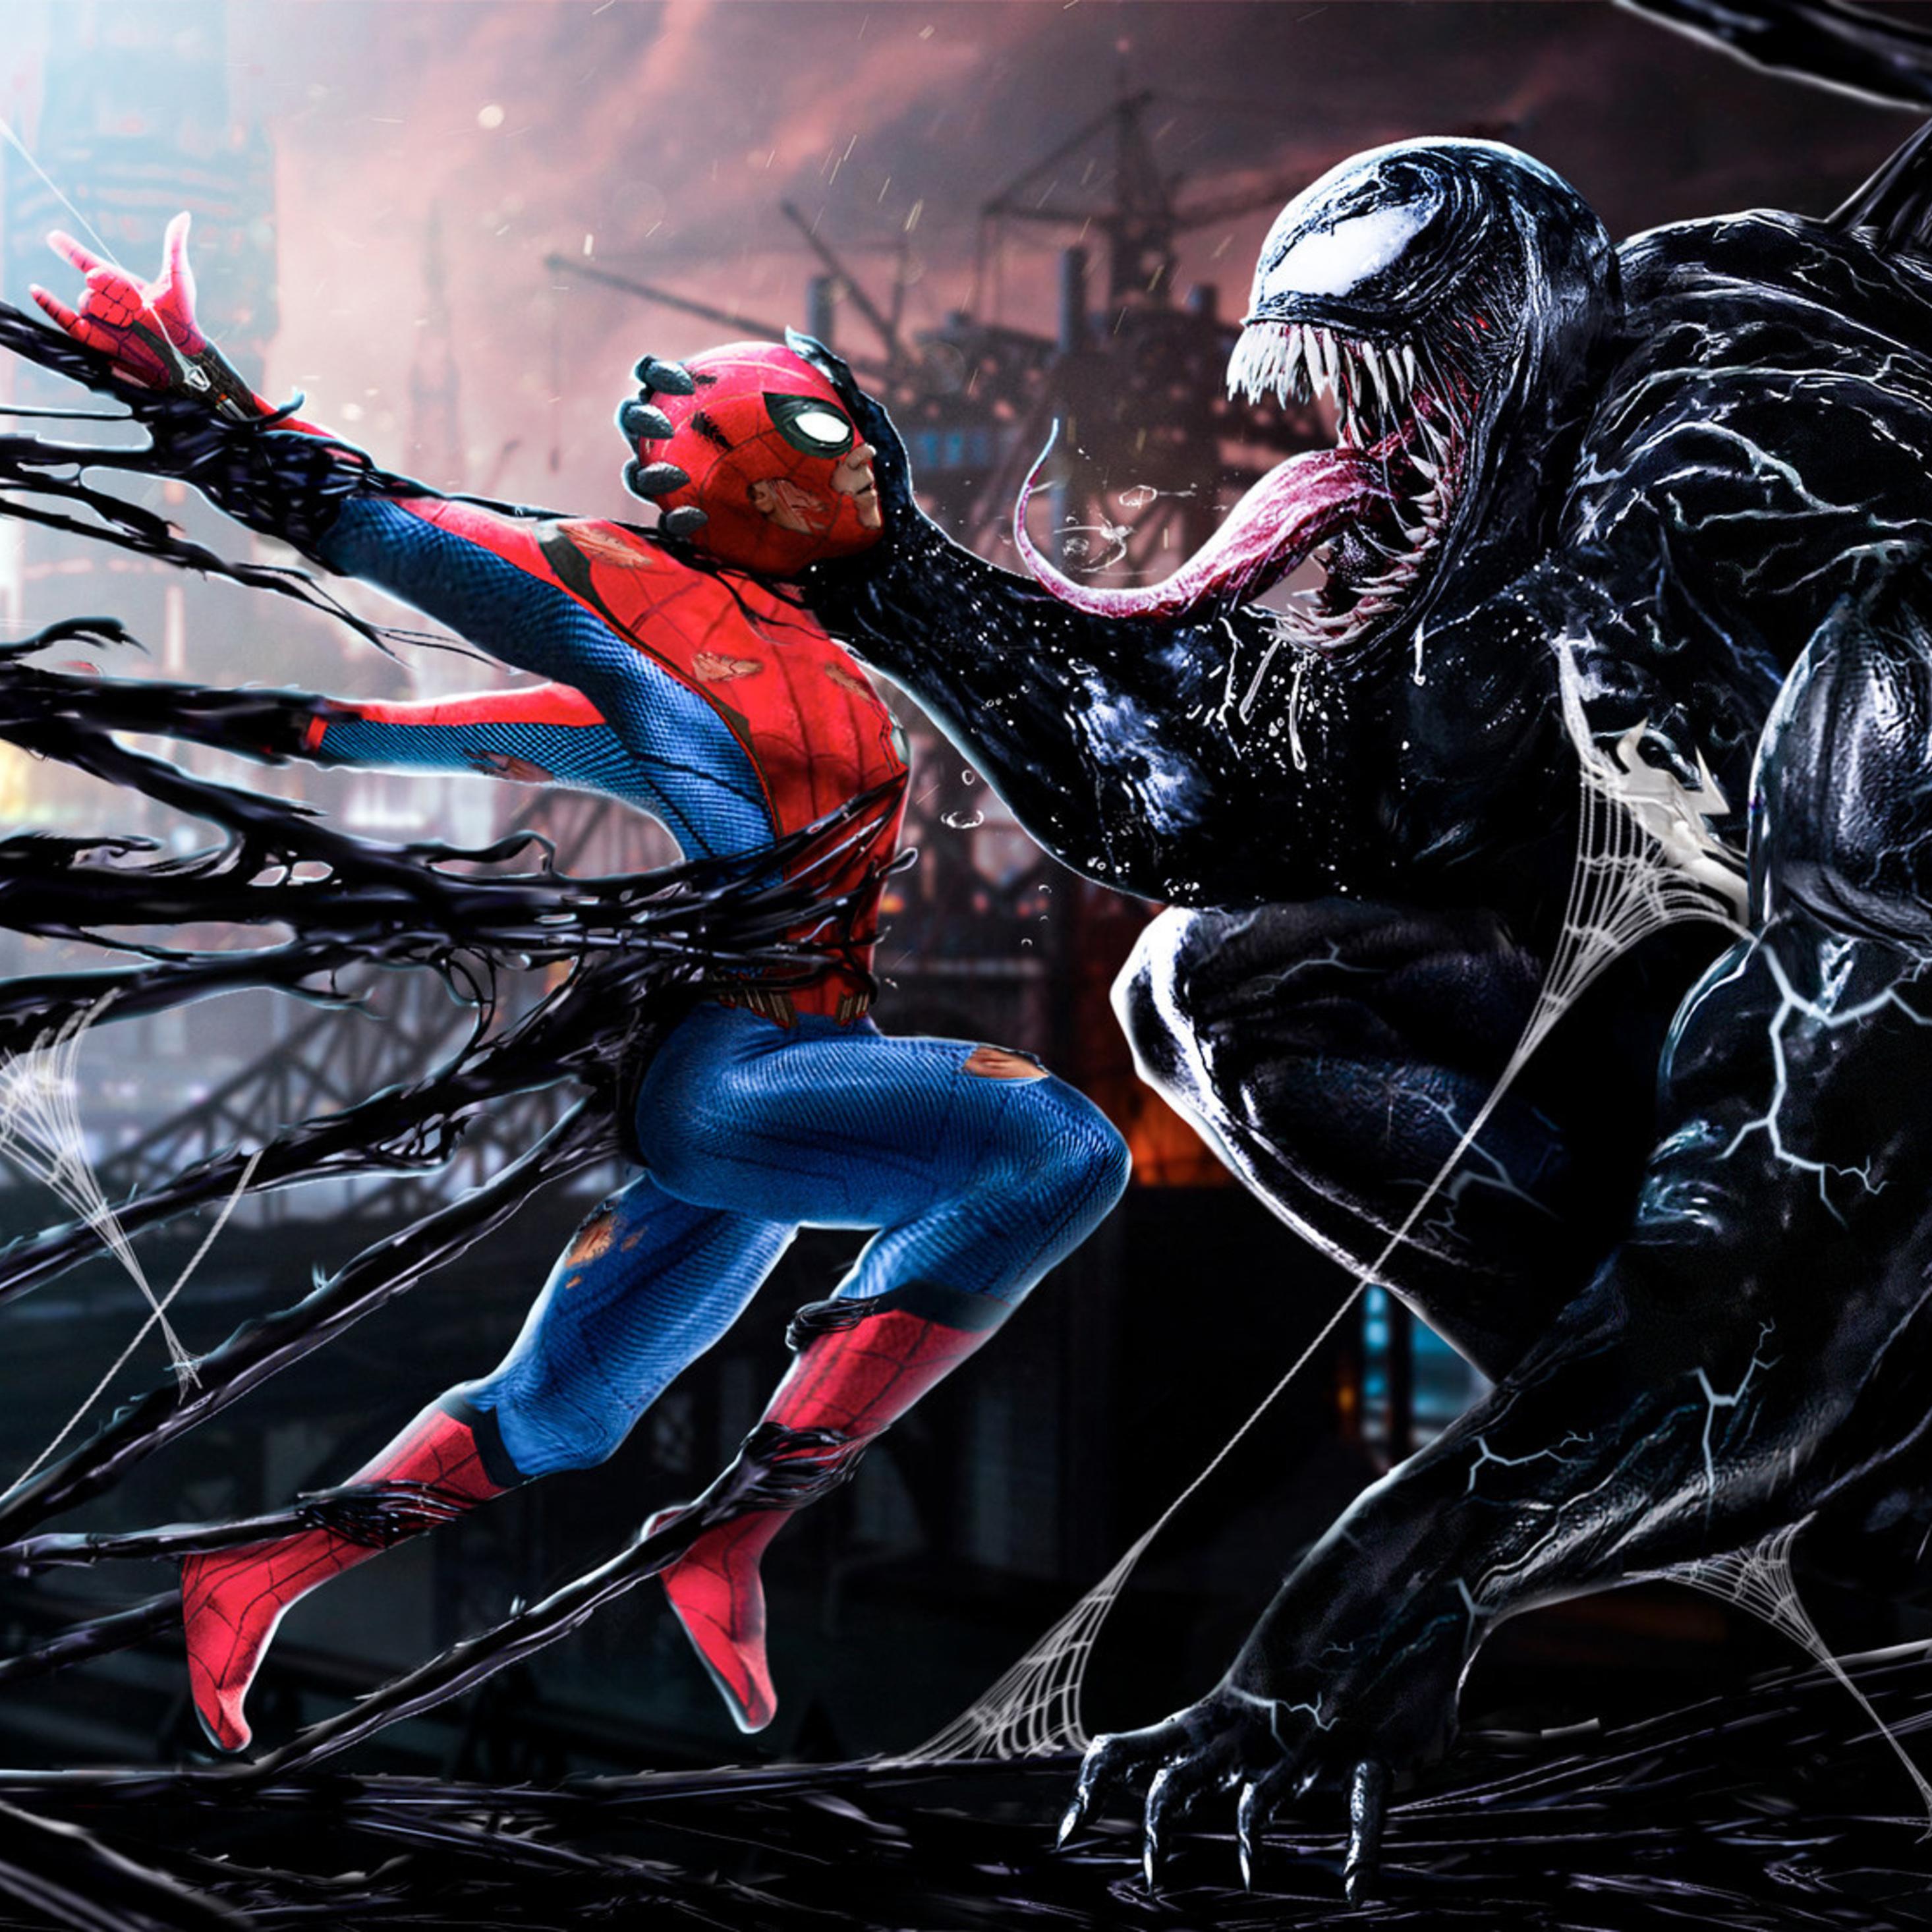 Venom Wallpapers: 2932x2932 Spiderman Vs Venom Digital Art Ipad Pro Retina